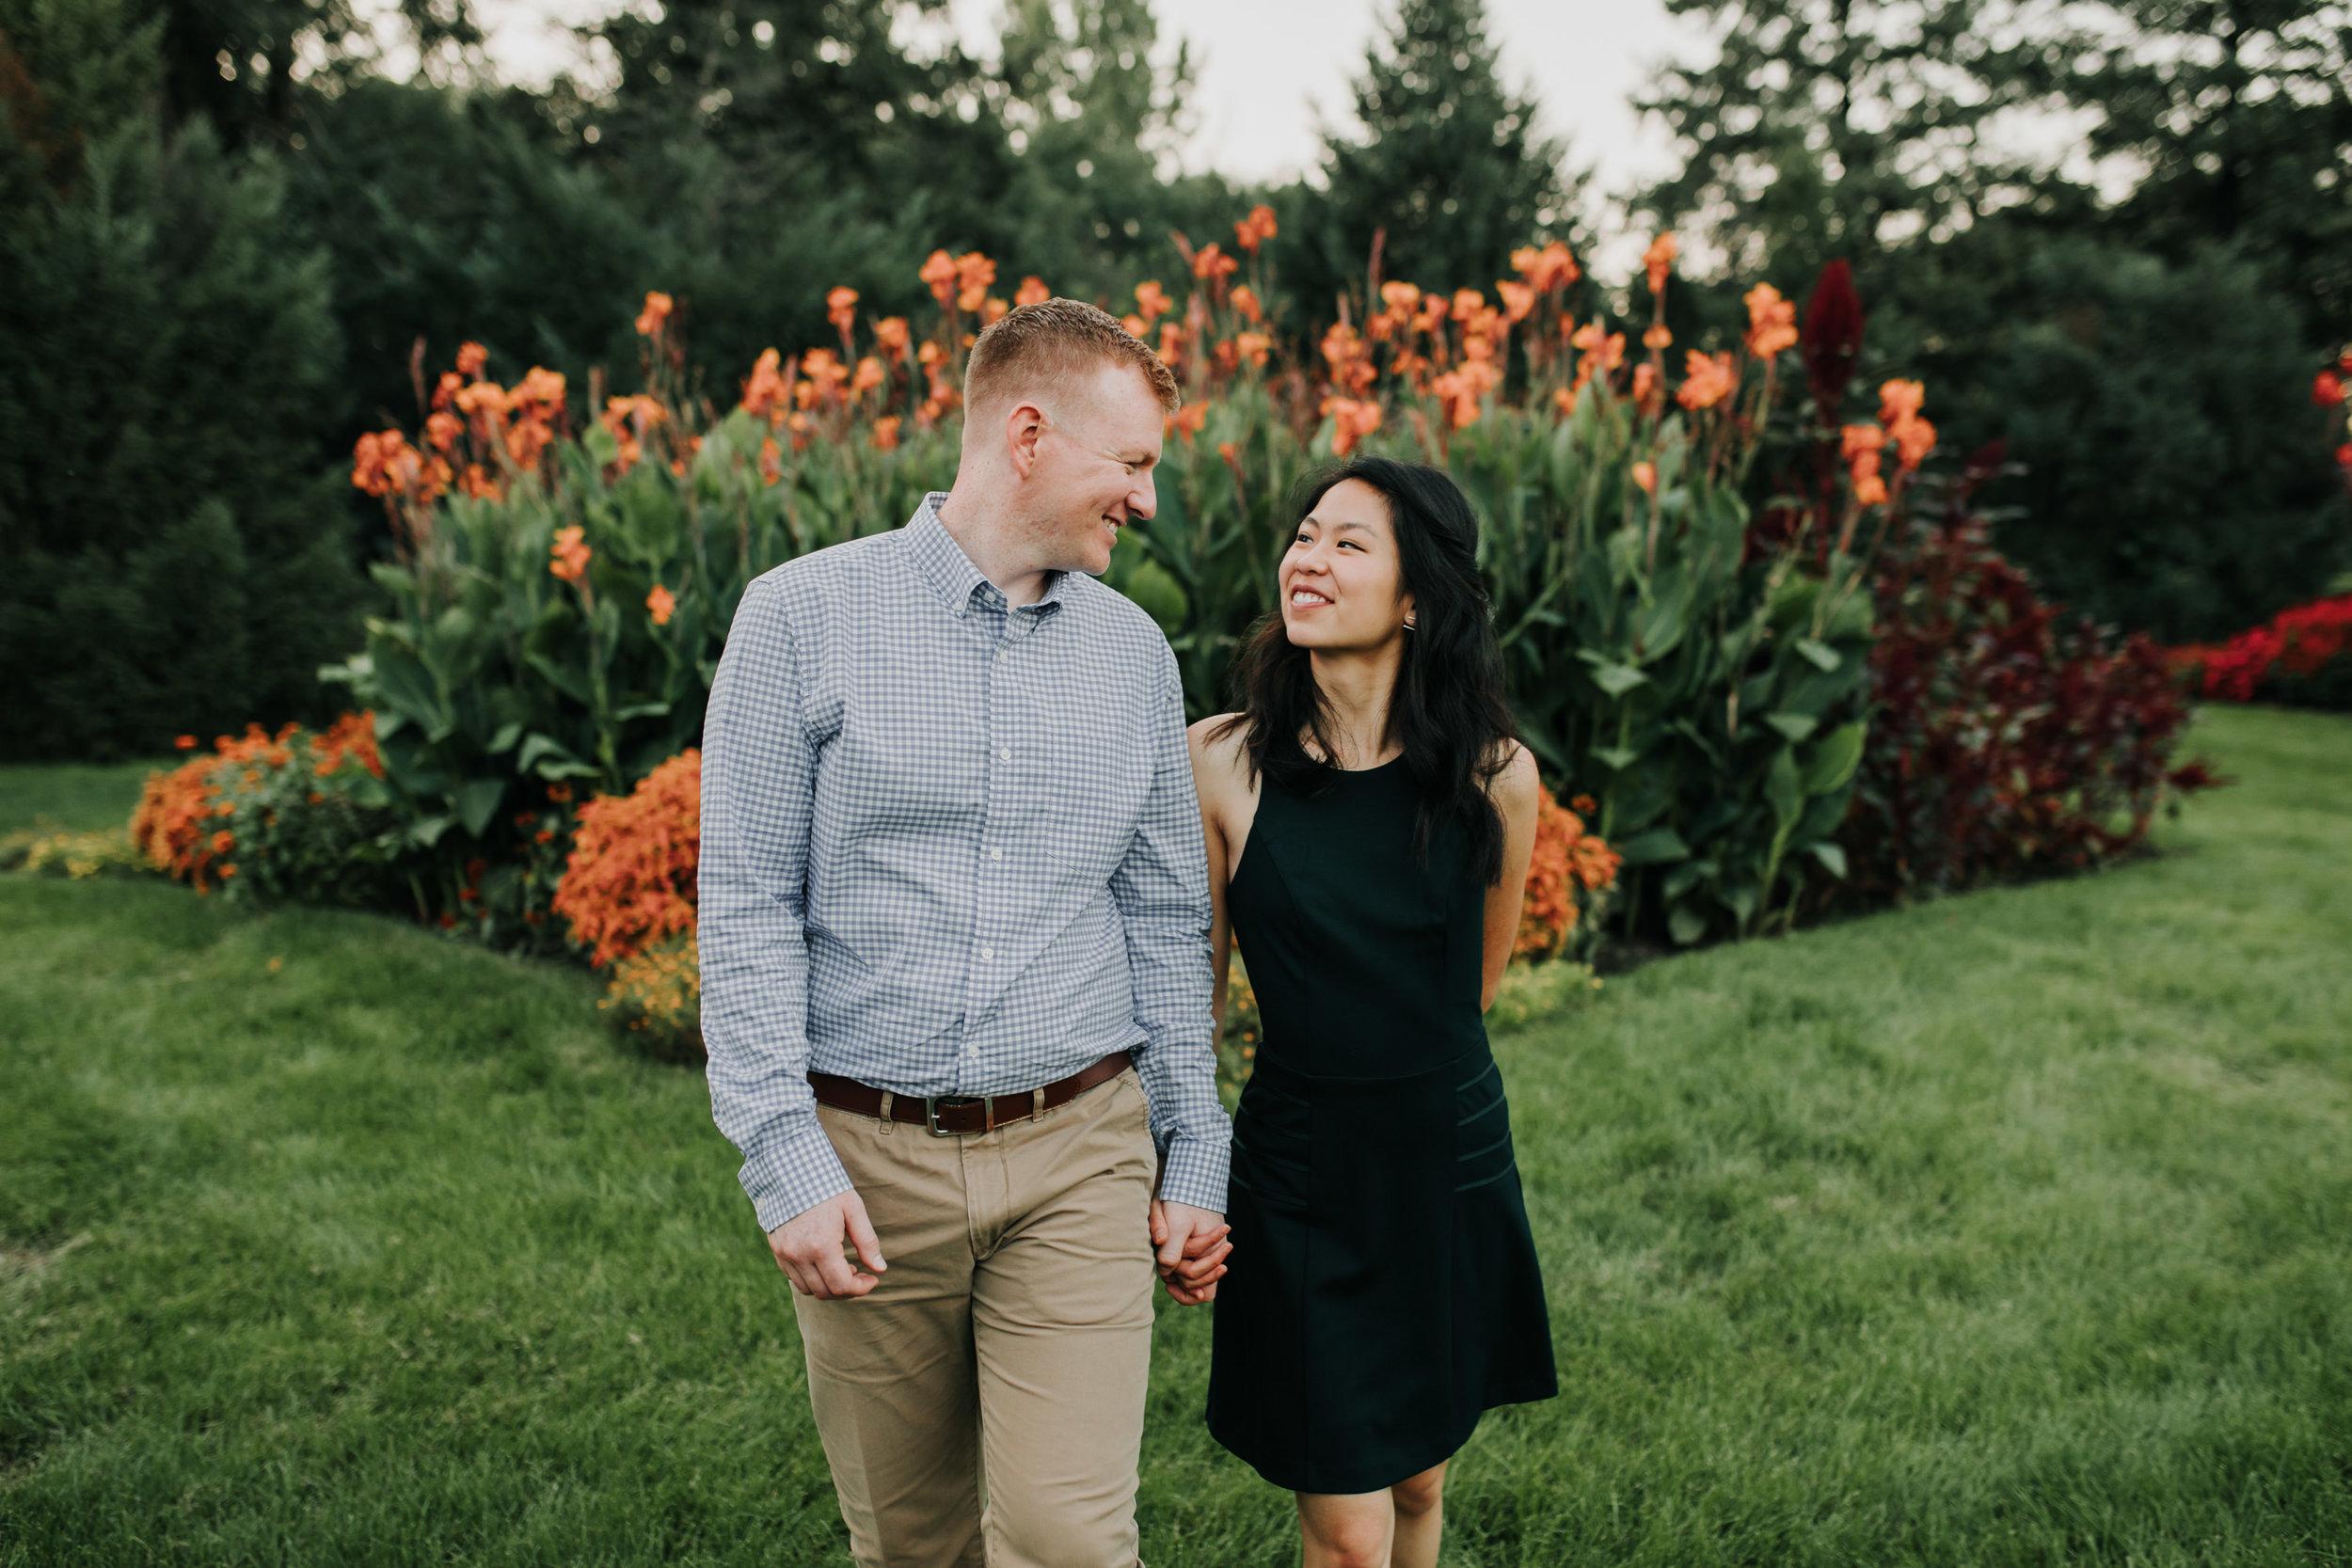 Catherin & Kyle - Married - Nathaniel Jensen Photography - Omaha Nebraska Wedding Photograper - Memorial Park - Joslyn Castle Engagement Session-80.jpg